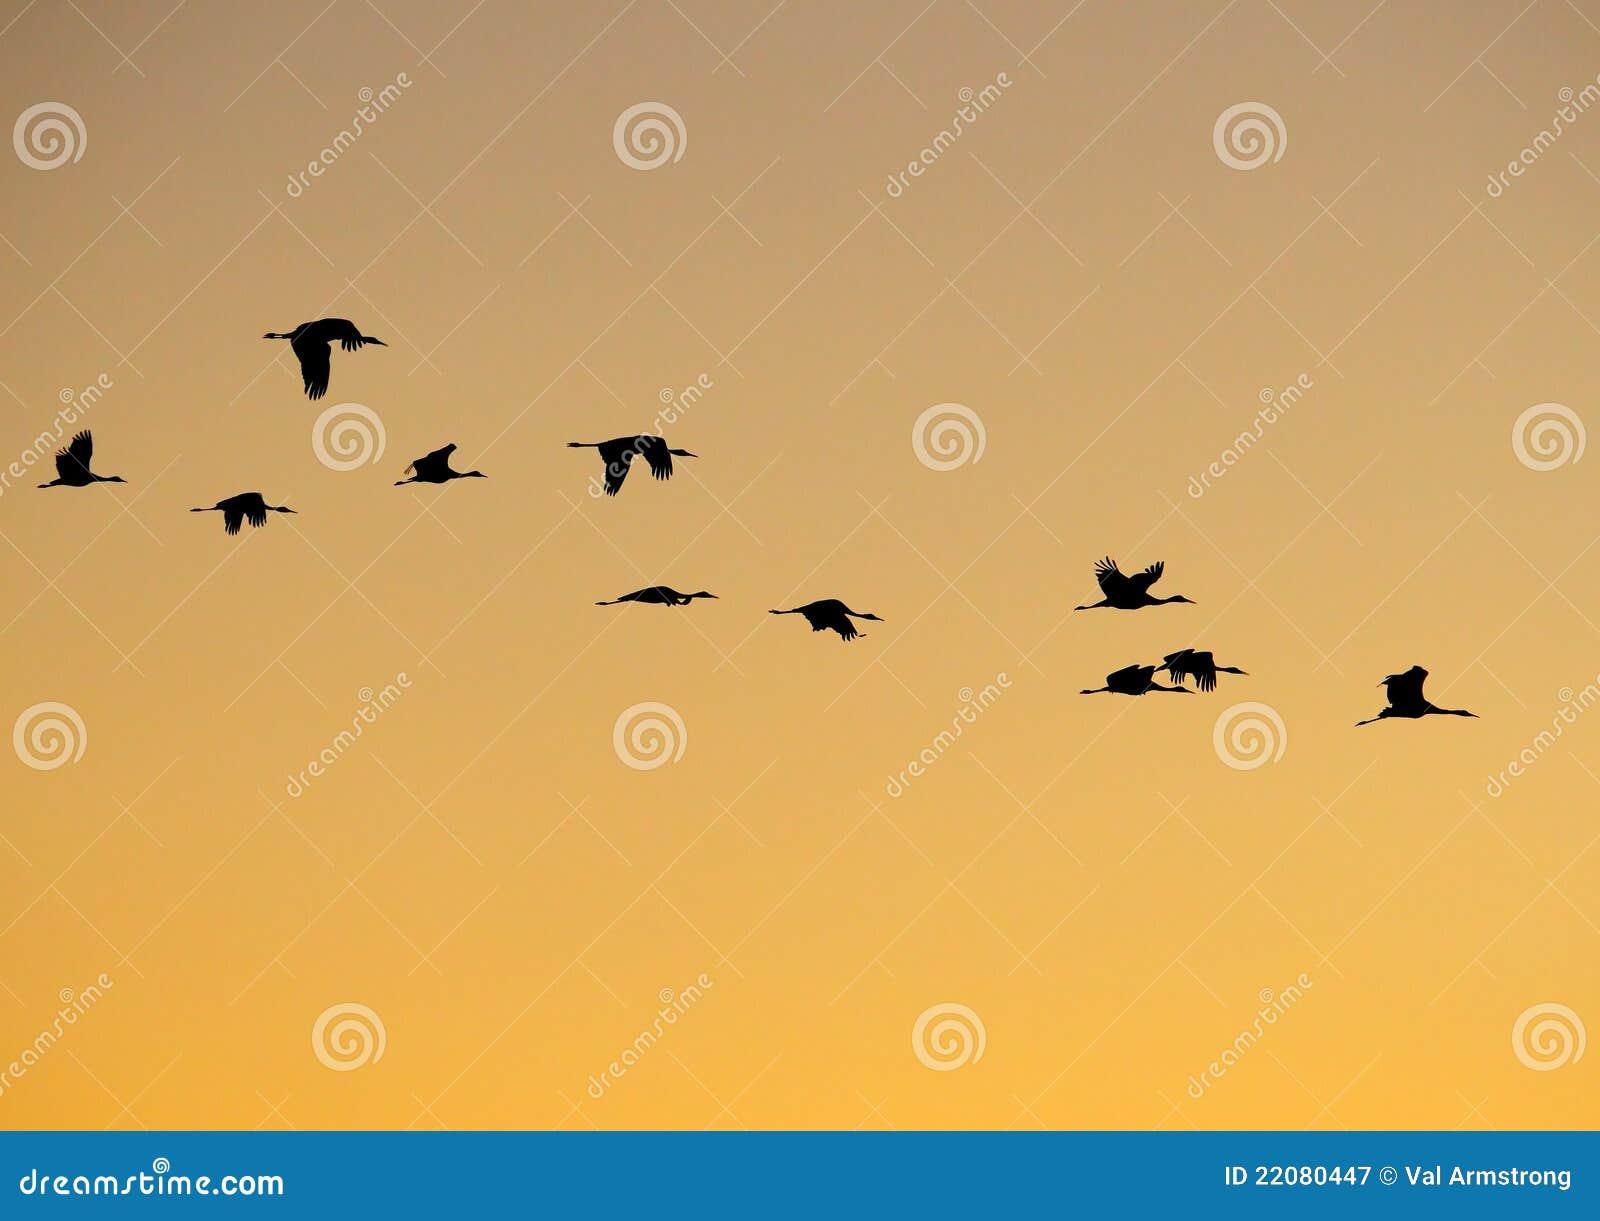 It Was Twilight And Sandhill Cranes >> Sandhill Crane Flight Pattern Stock Image Image Of Feather Cranes